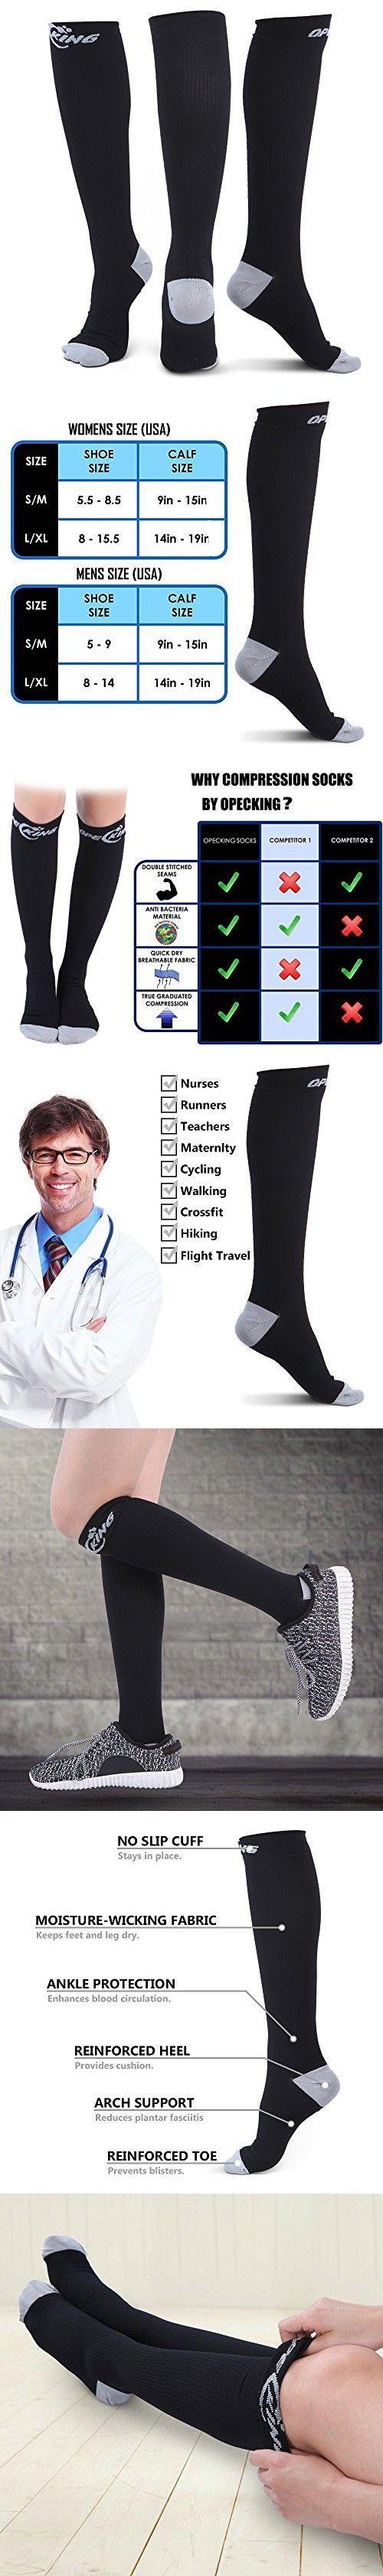 Graduated Compression Socks for Men & Women (20-30mmHg) Leg Support for Flight, Maternity, Athletics, Travel, Nurses,Trucker - Medical Care Grade for Shin Splints,Edema,Arthritis,Calf and Leg Pain